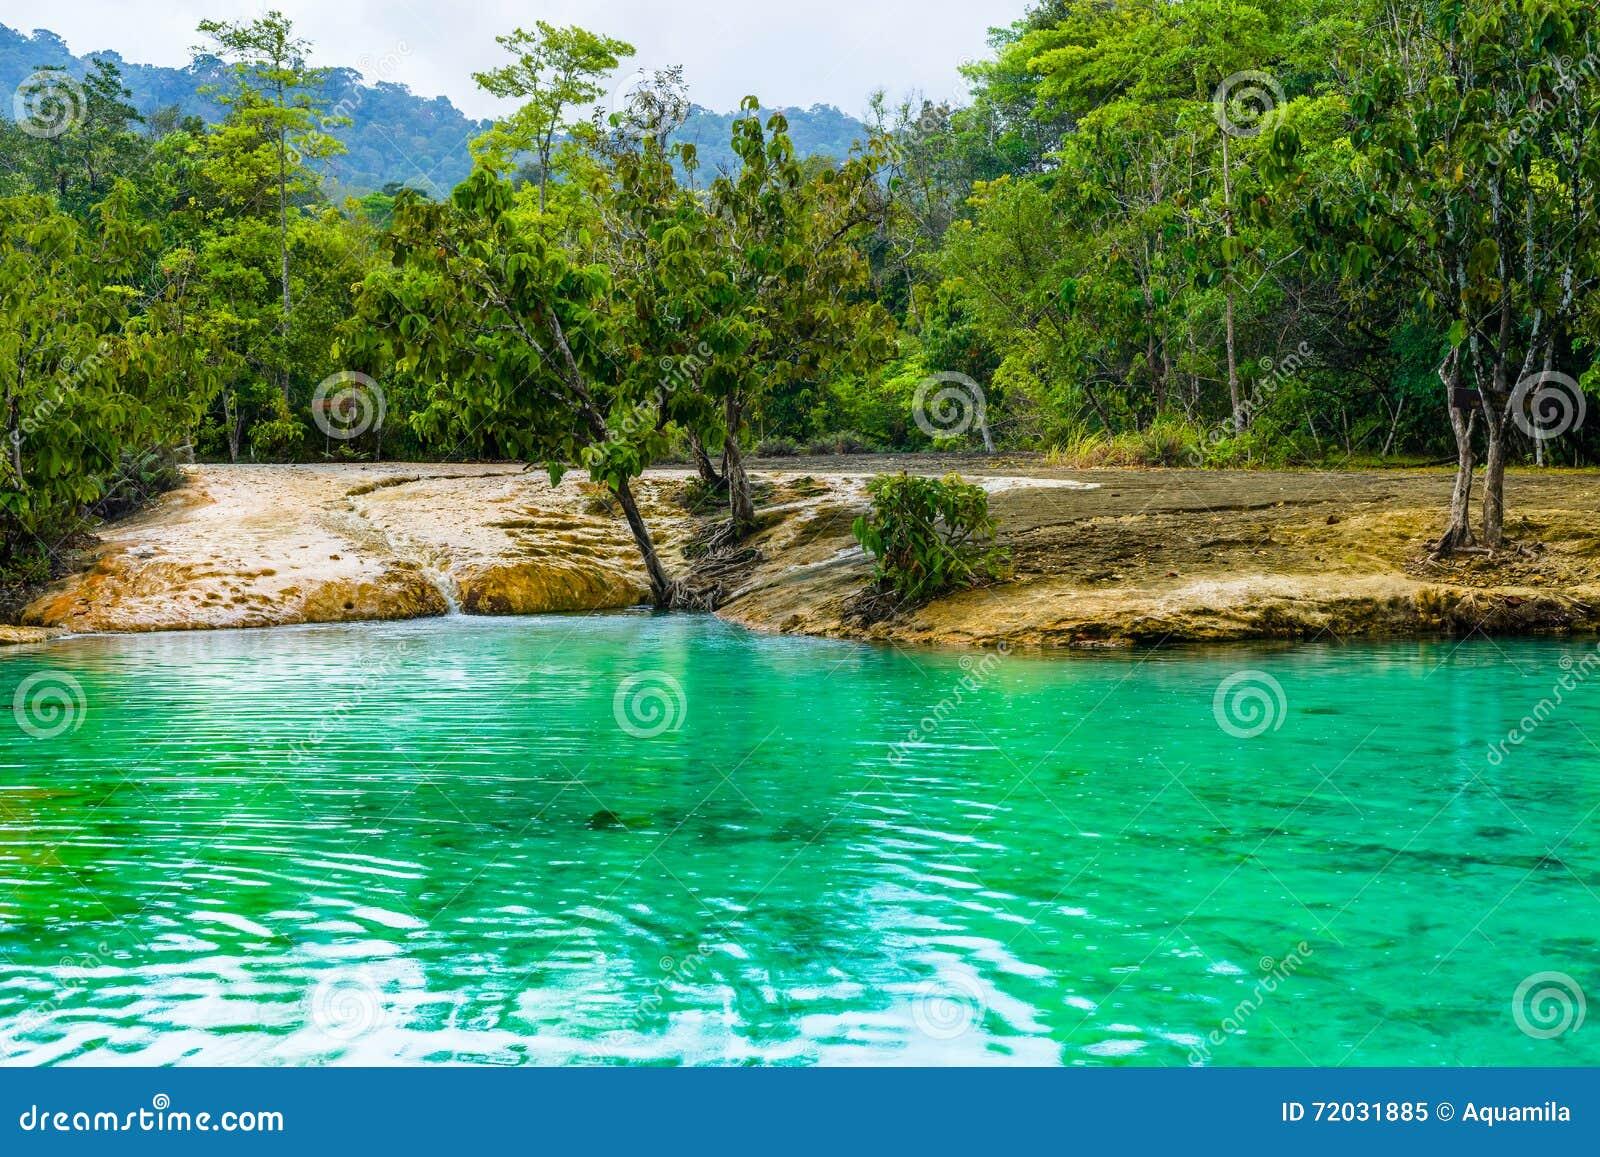 Emerald Pool alias Sa Morakot, Knall Khao Pra Khram-Naturschutzgebiet, Krabi, Thailand Grüne Farbtropischer See, Südostasien